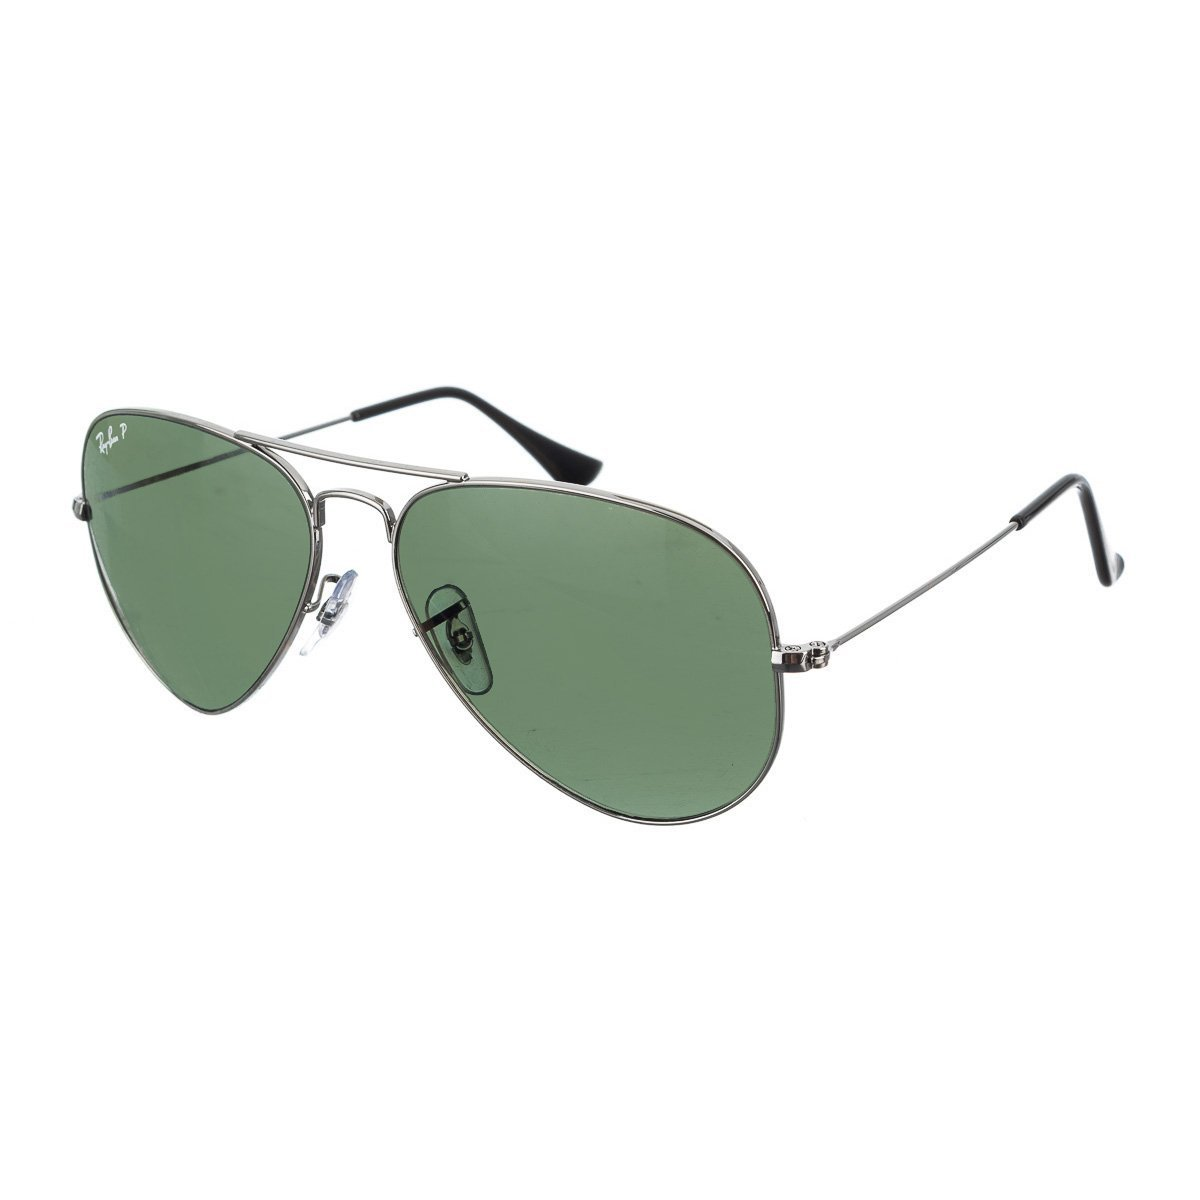 Ray-Ban 3025 Aviator Large Metal Non-Mirrored Polarized Sunglasses, Gunmetal/Green (004/58), 58mm